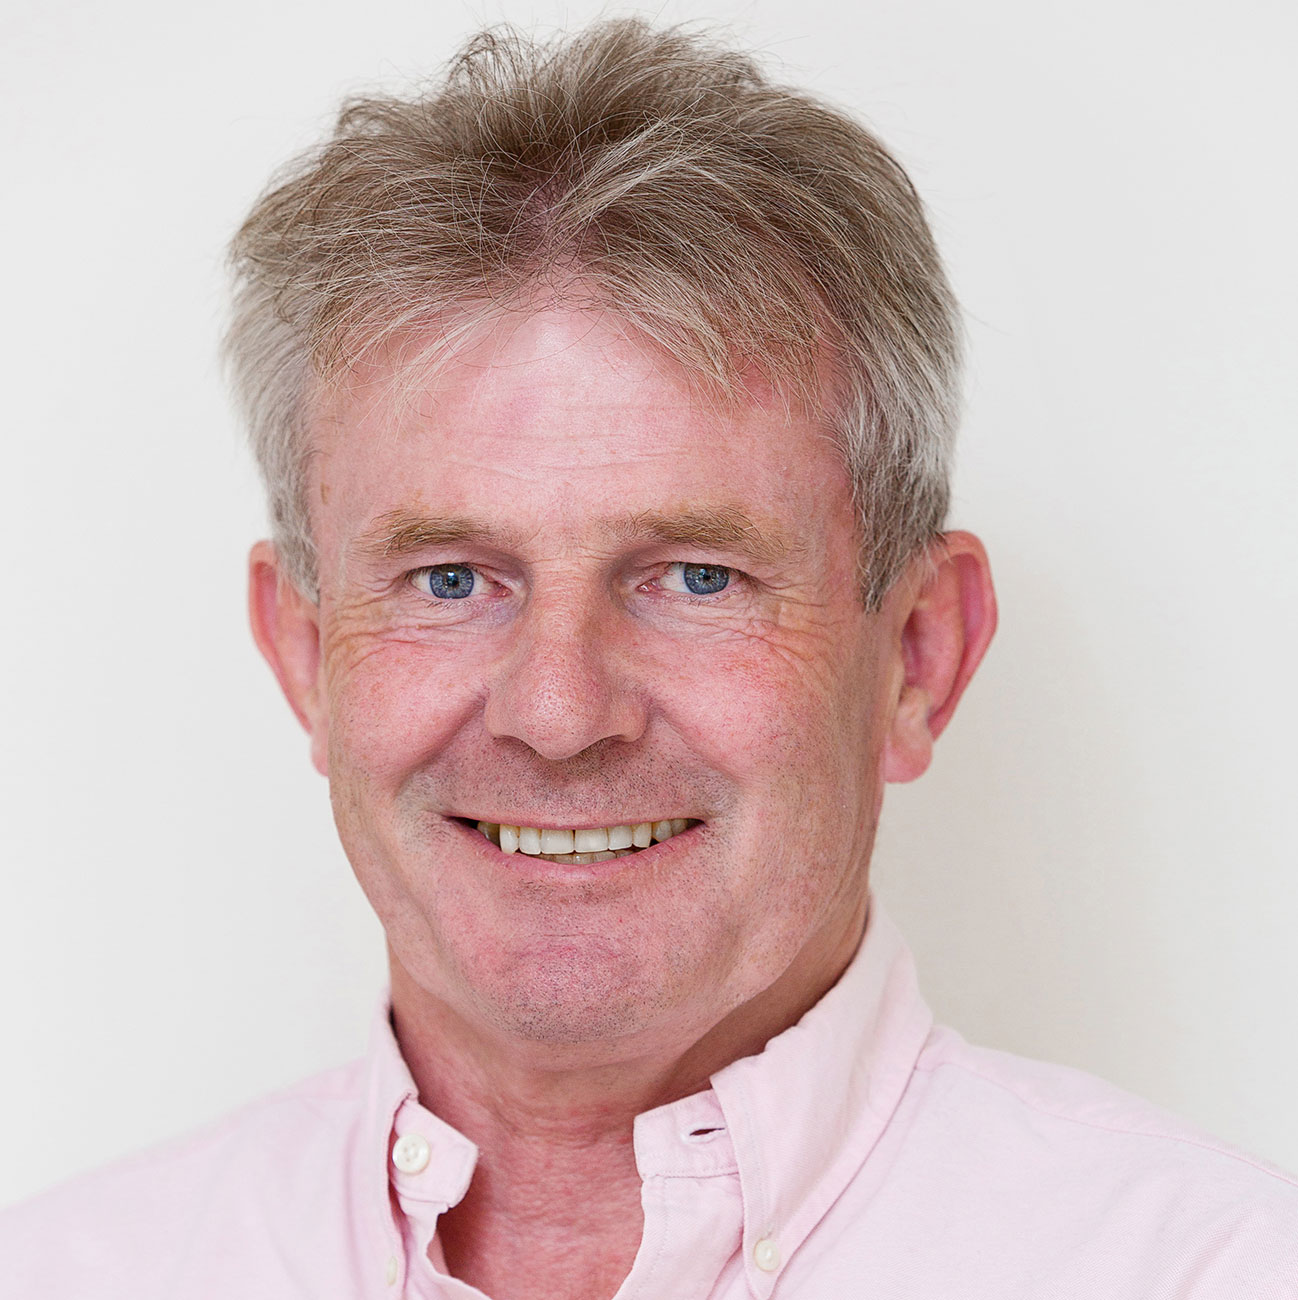 Kevin Murray, Srategic Advisor